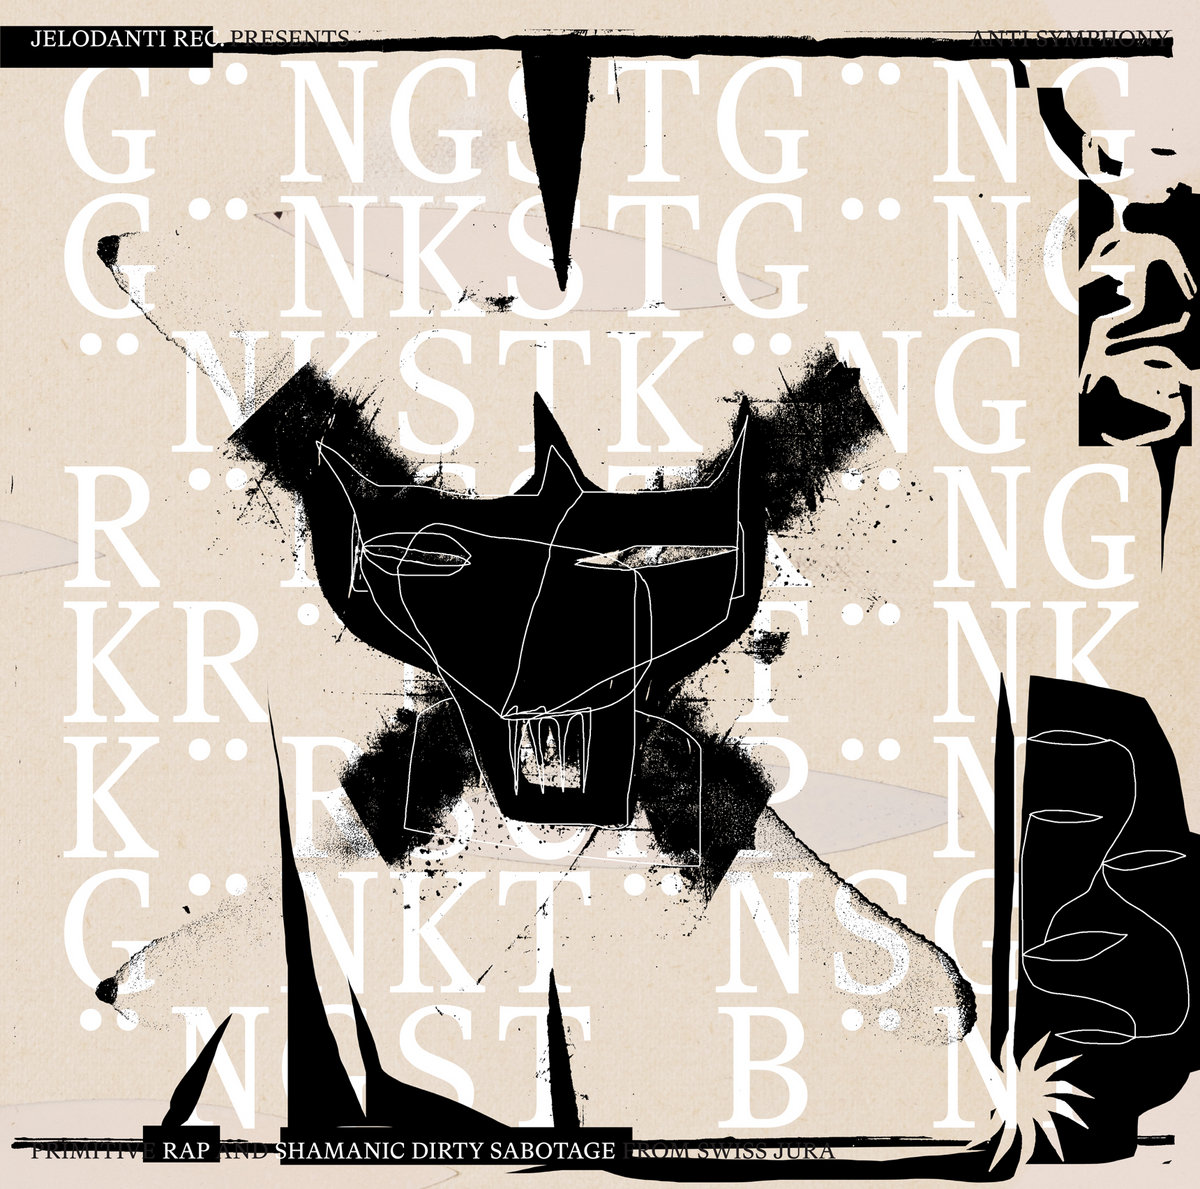 GÄNGSTGÄNG - Primitive rap and shamanic dirty sabotage from swiss Jura